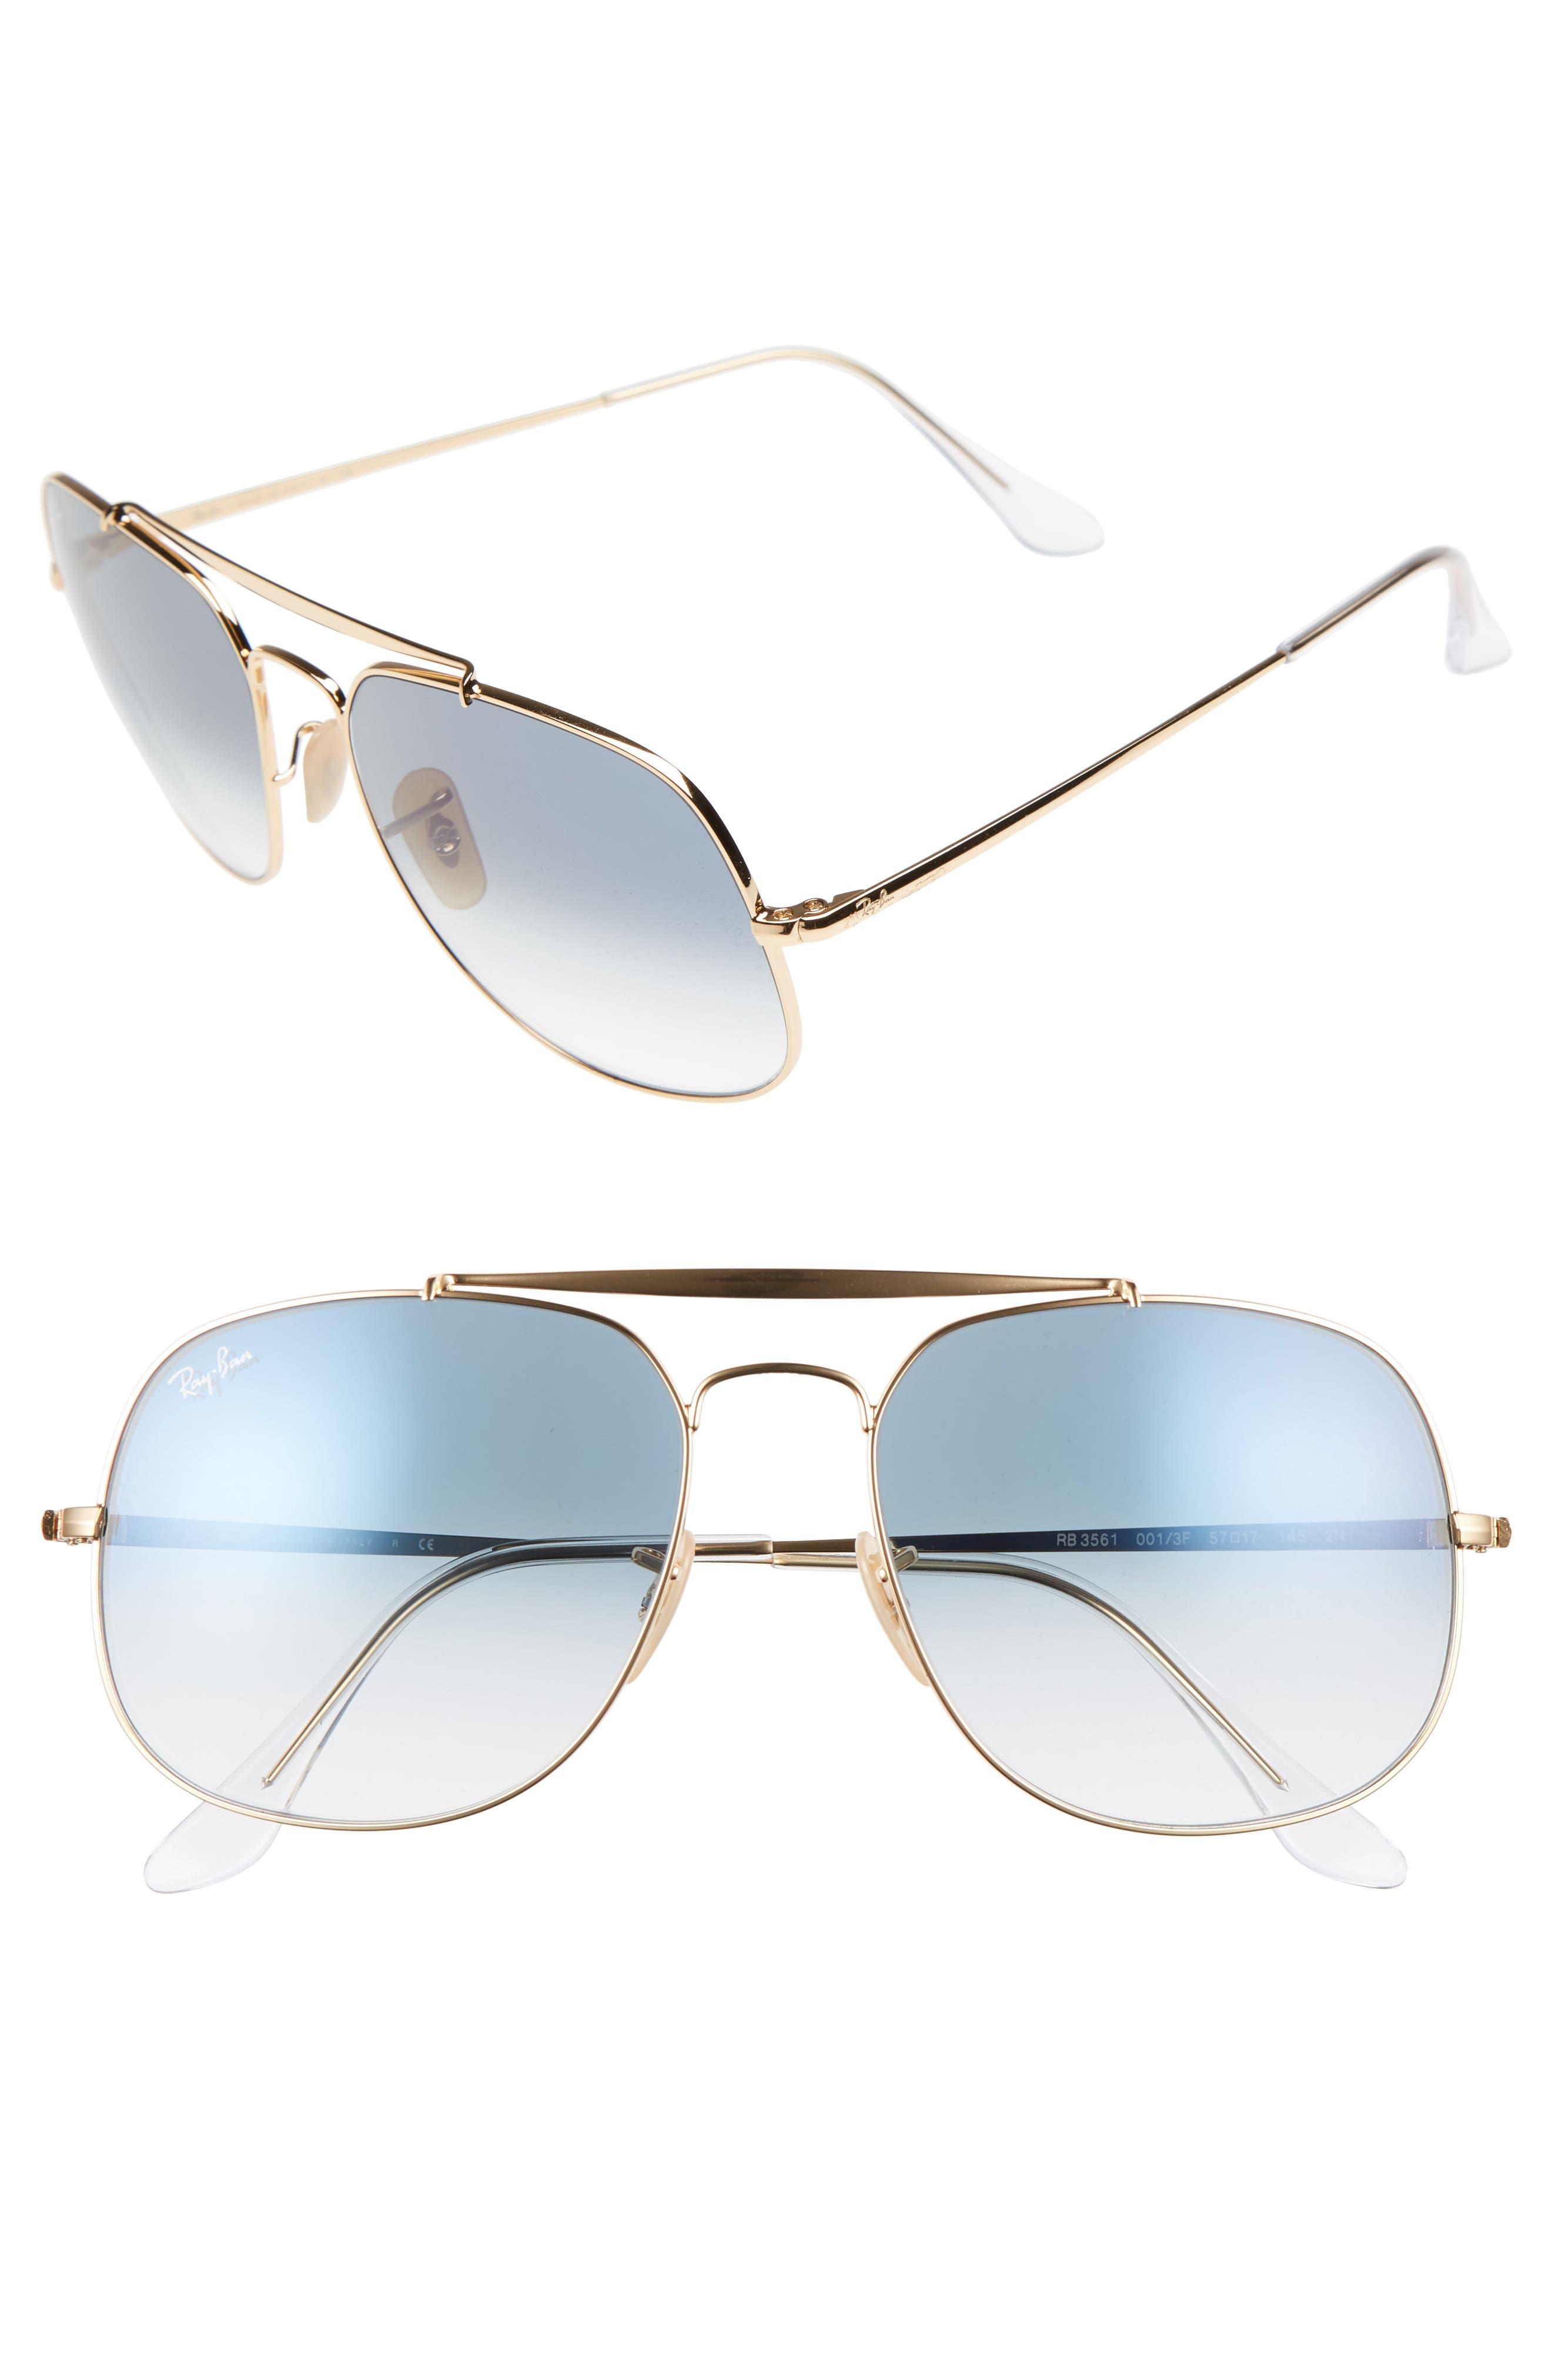 Ray-Ban 57Mm Navigator Sunglasses -